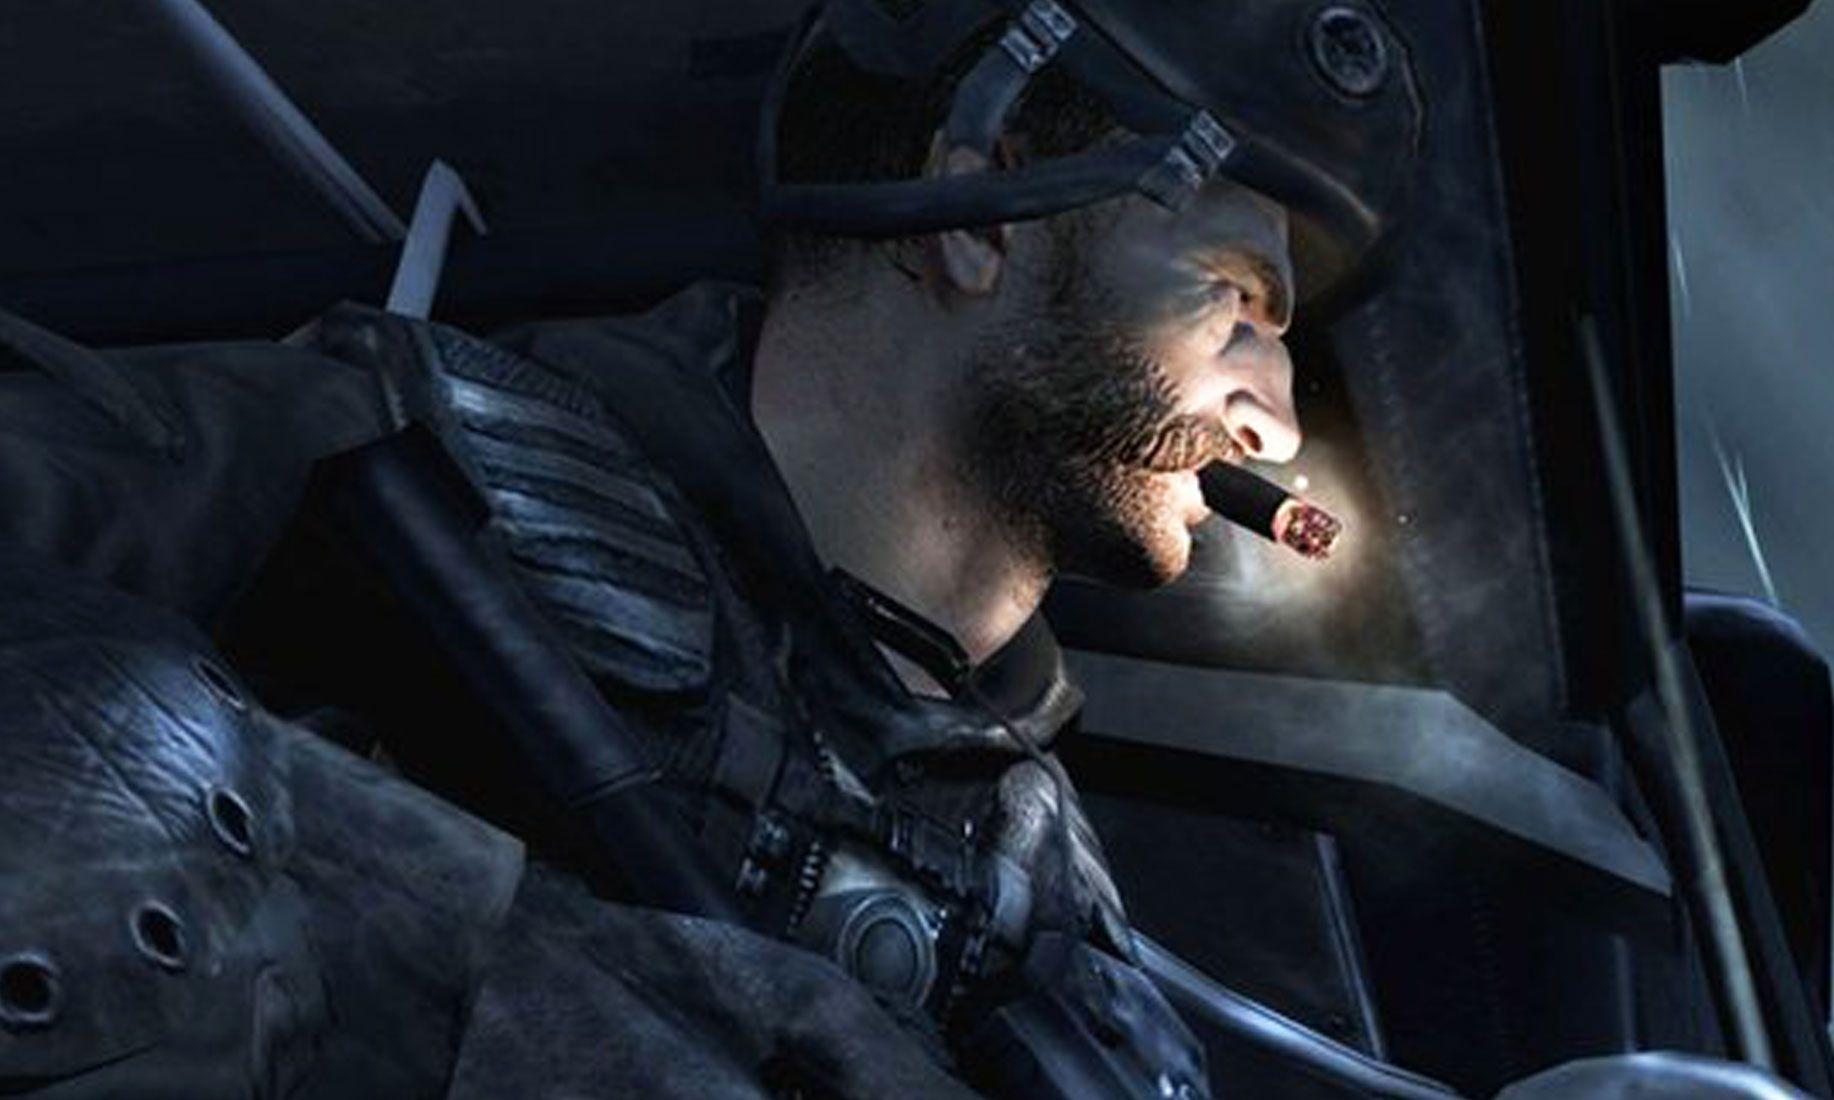 Captain Price Call Of Duty Modern Warfare Call Of Duty Video Game Quotes Modern Warfare